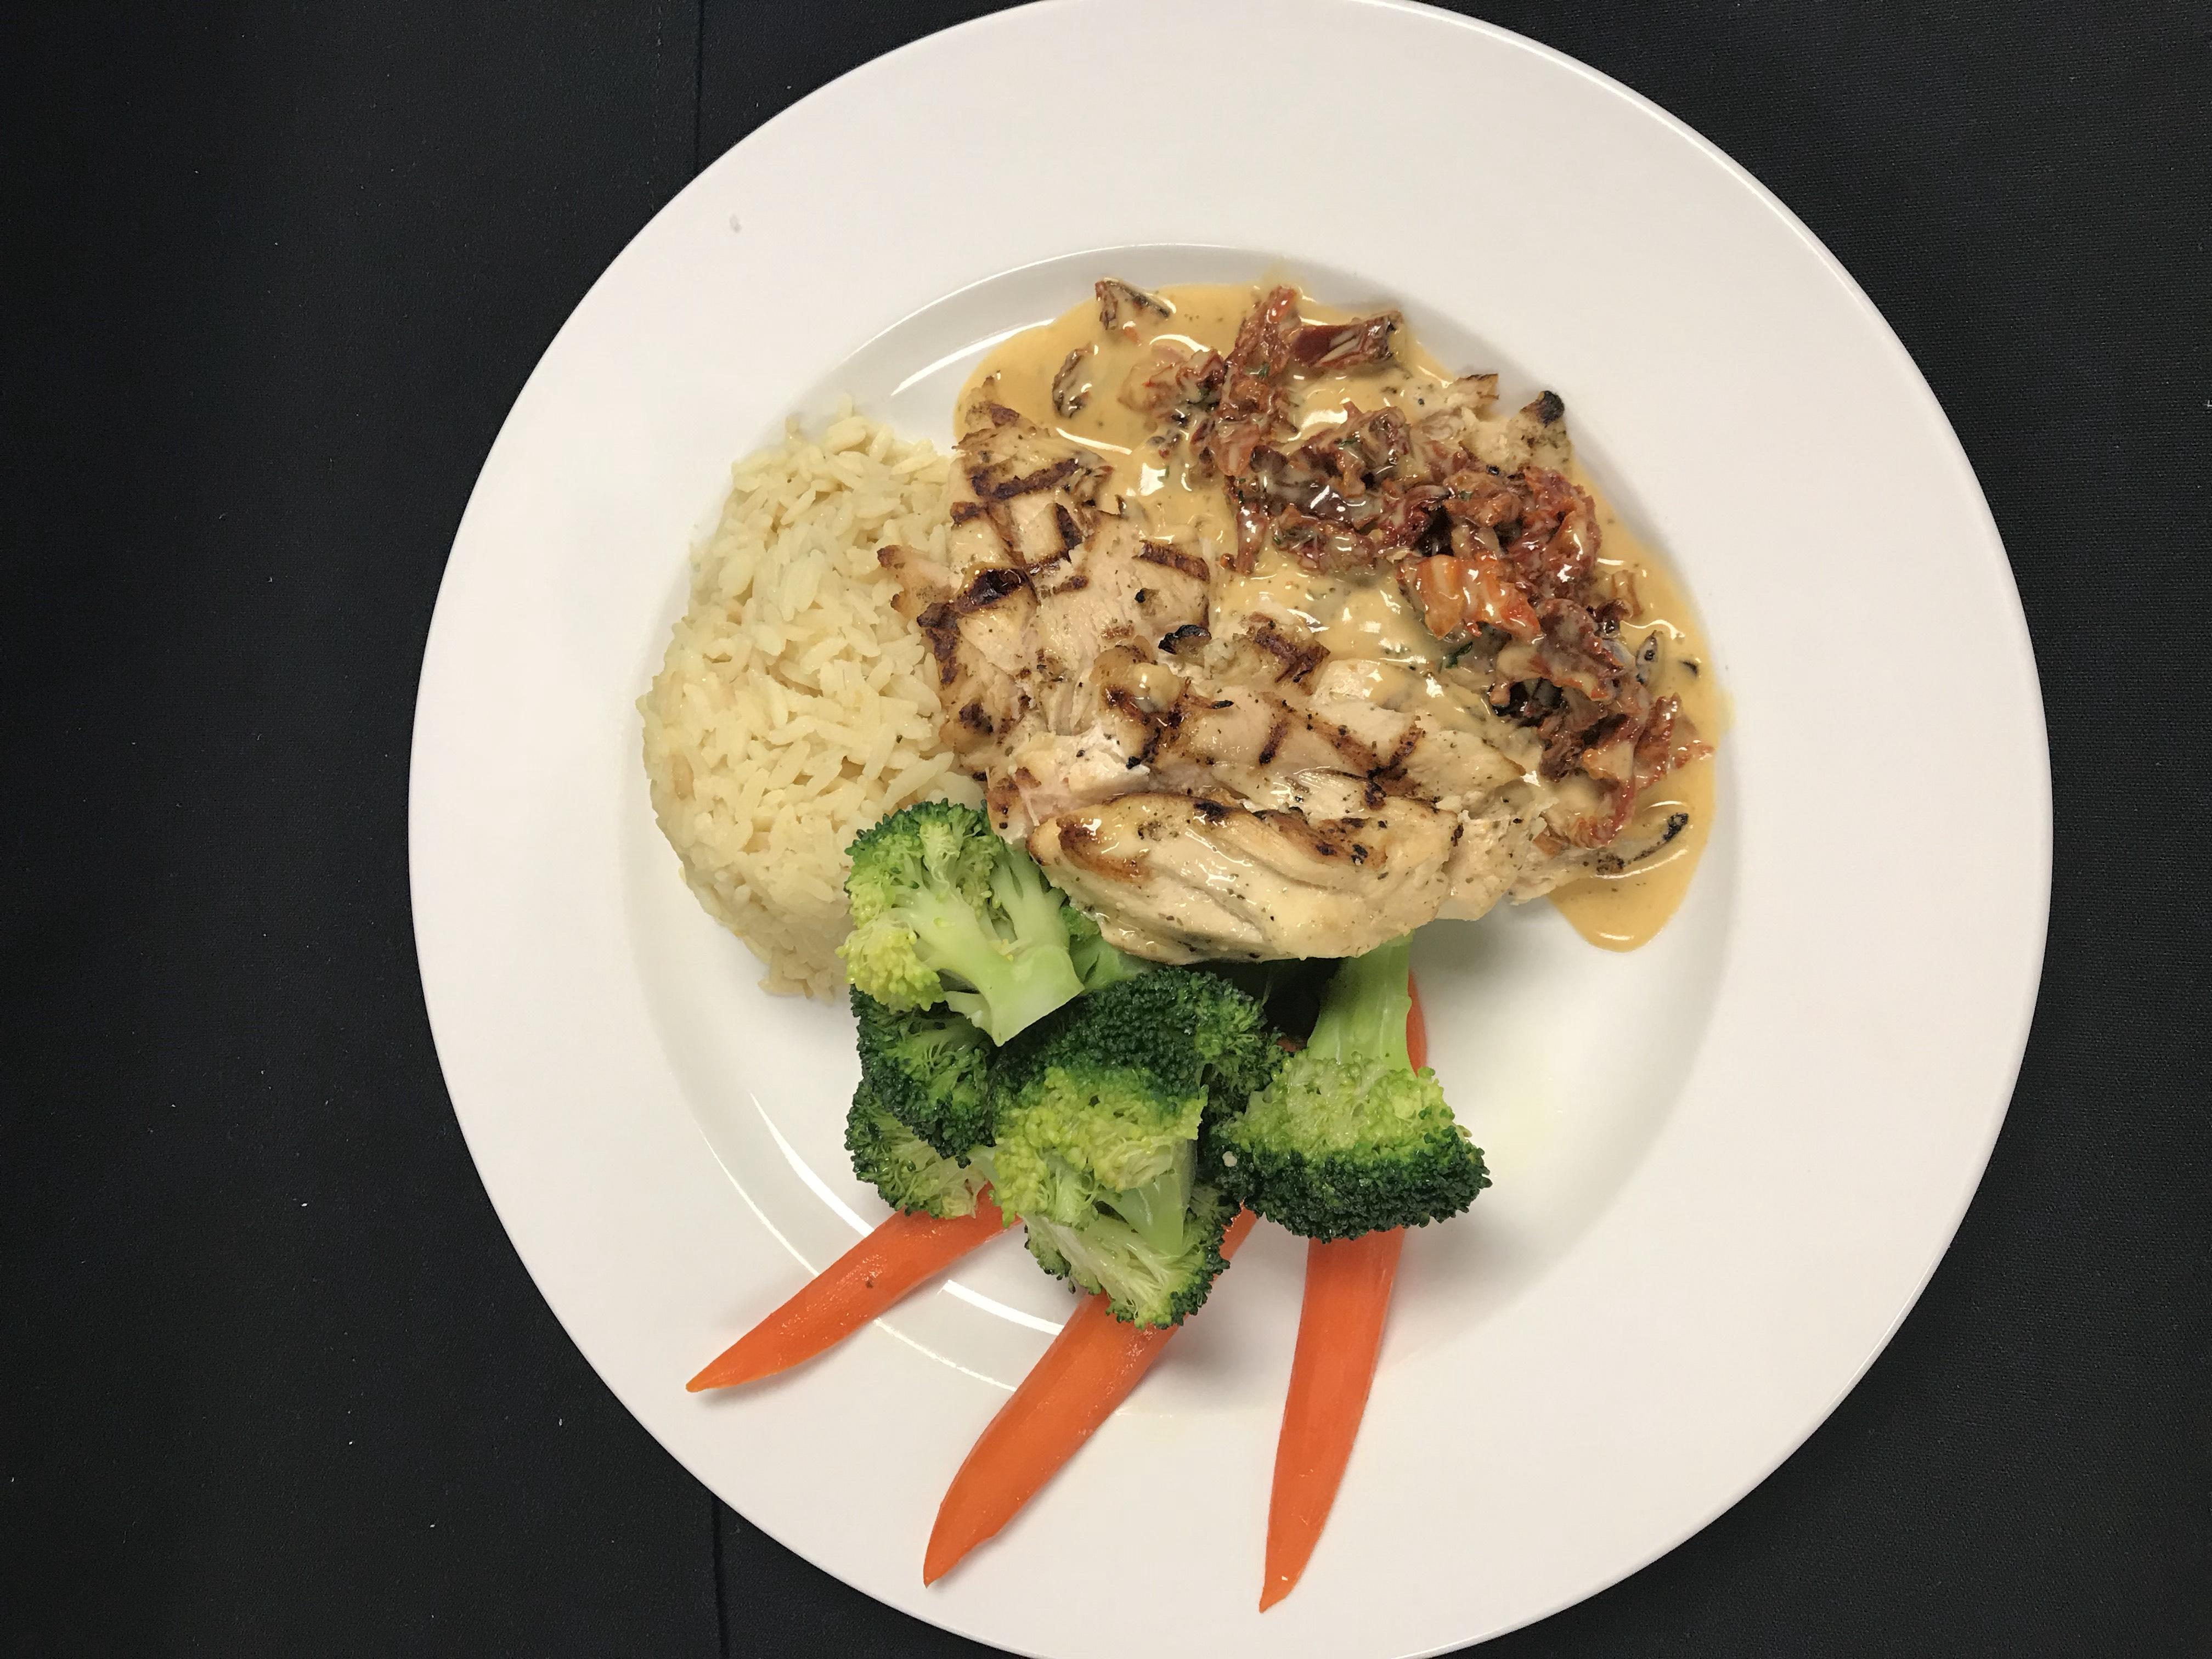 Chicken-Chardonnay-Plated-Dinner-2.jpg